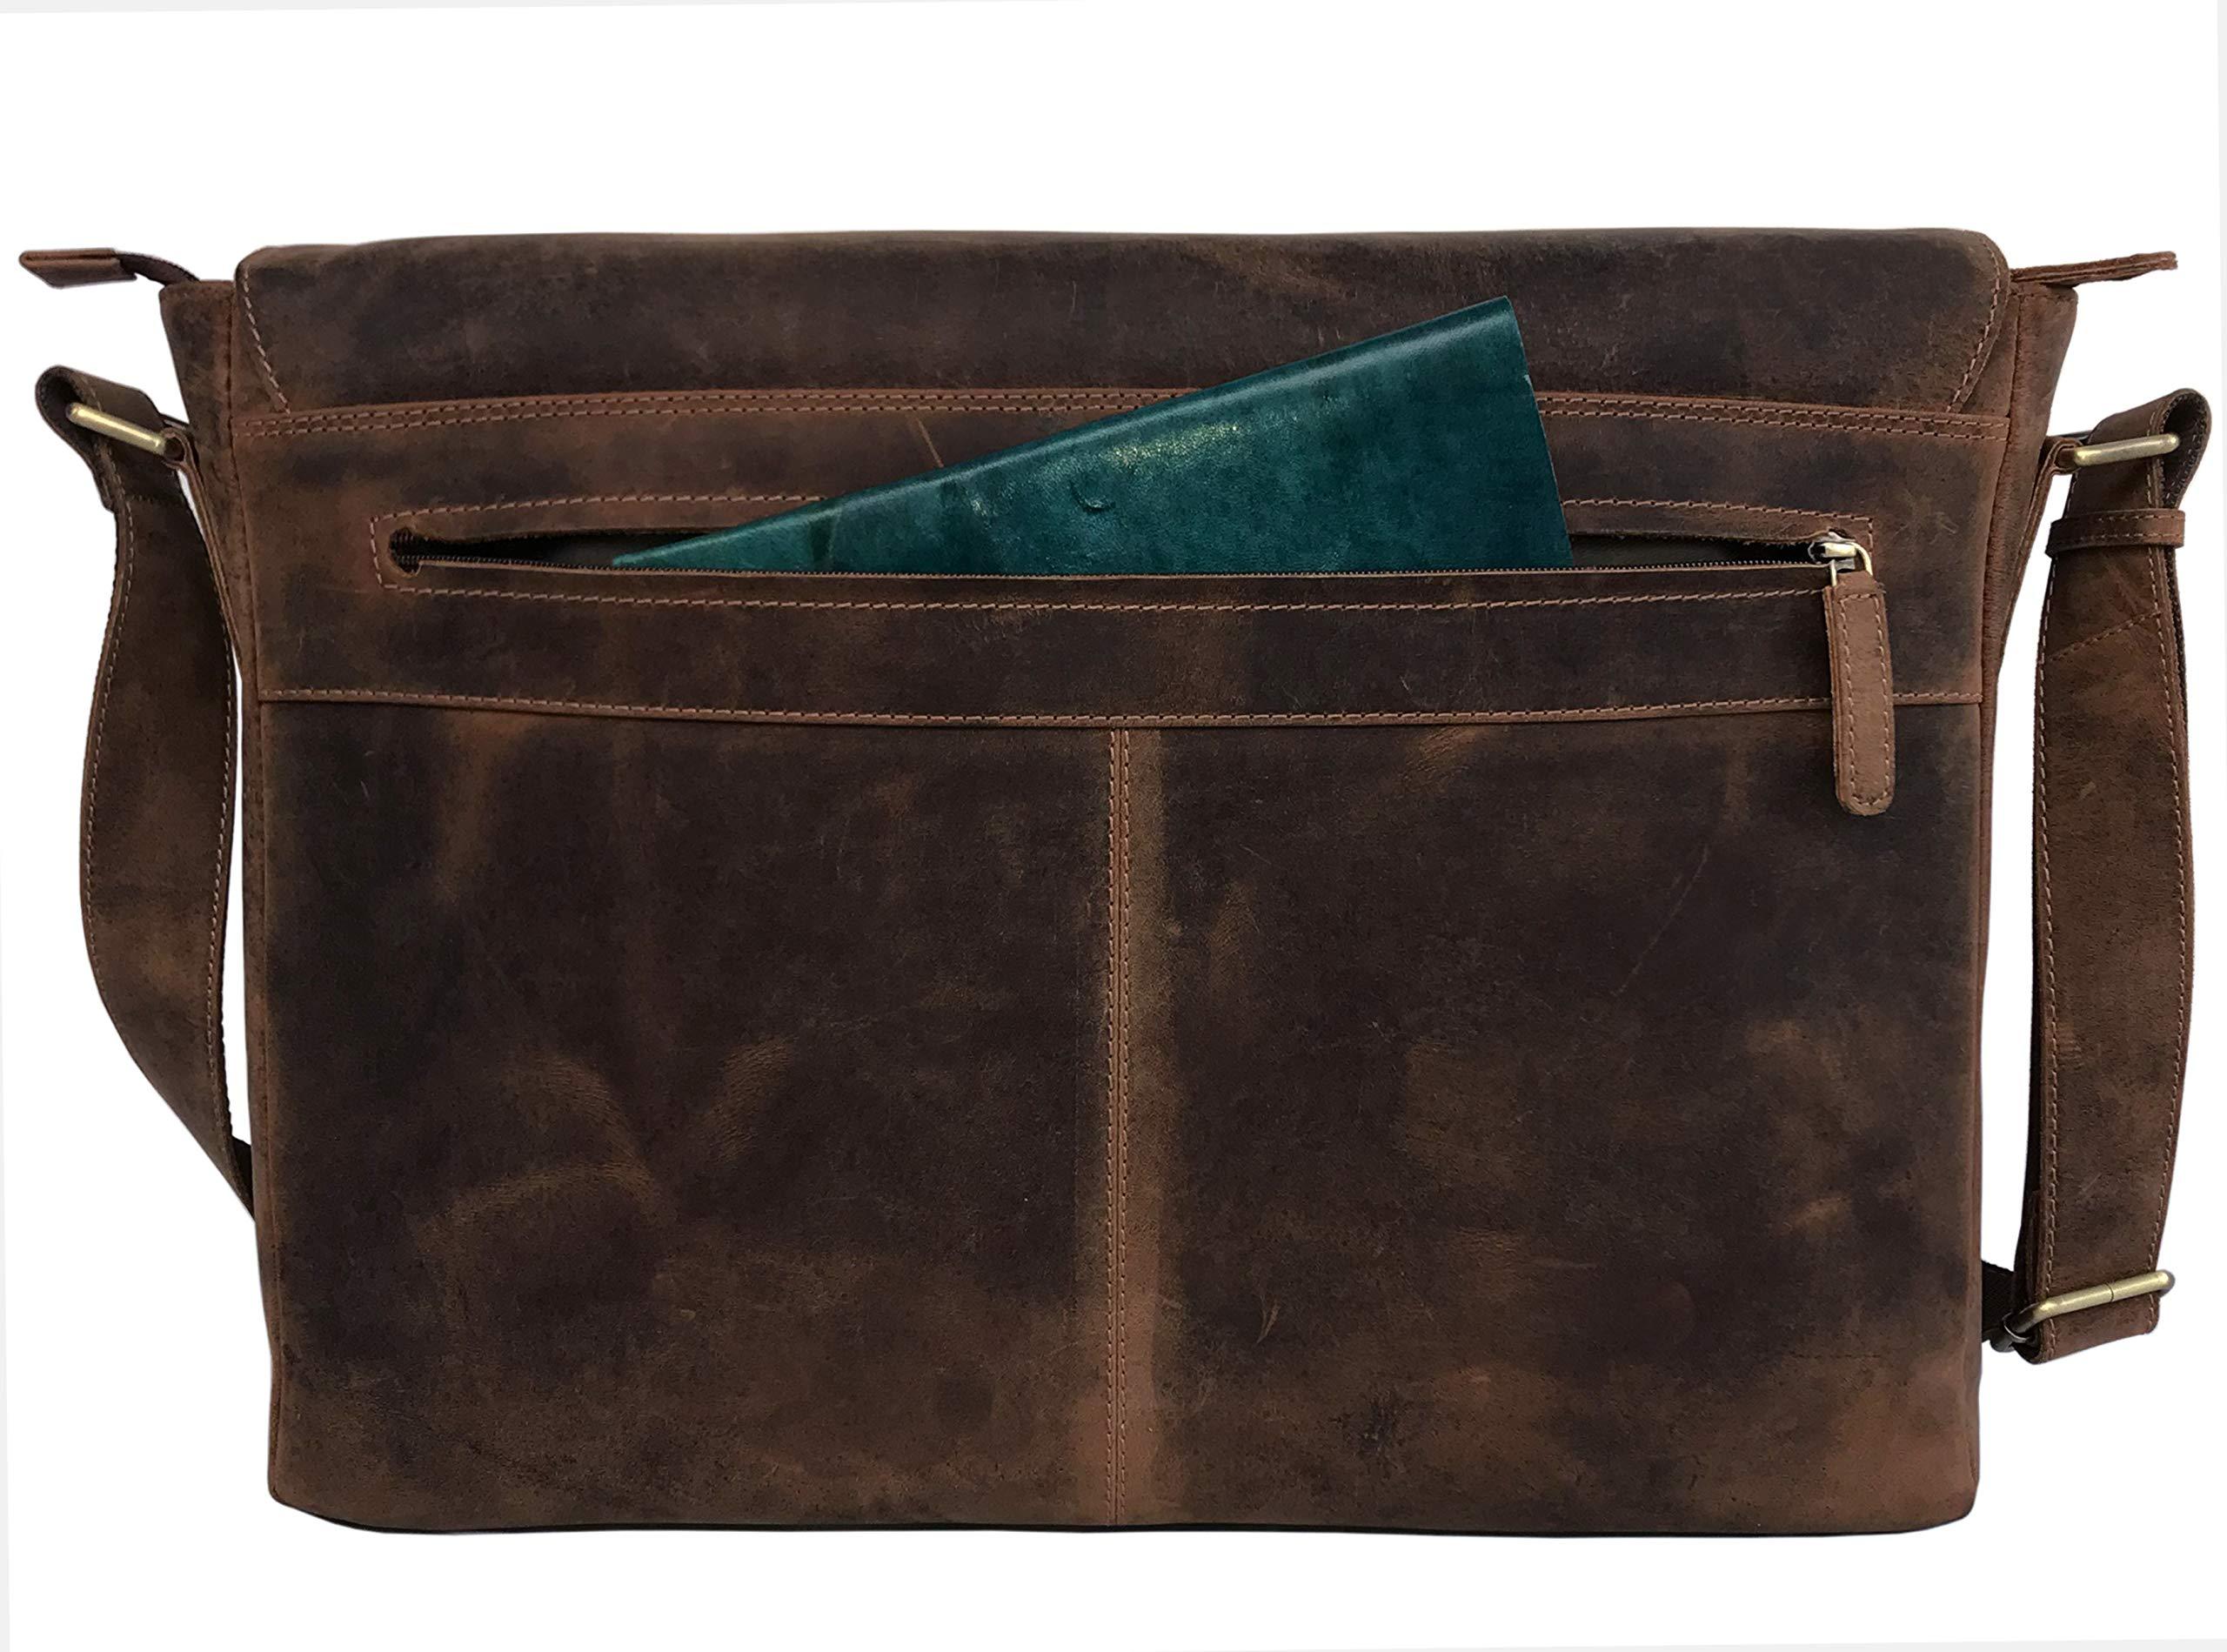 18'' Leather Messenger Bag Vintage Buffalo Satchel Laptop Briefcase Unisex Computer Bags for Men Women (Vintage Brown) by cuero (Image #4)